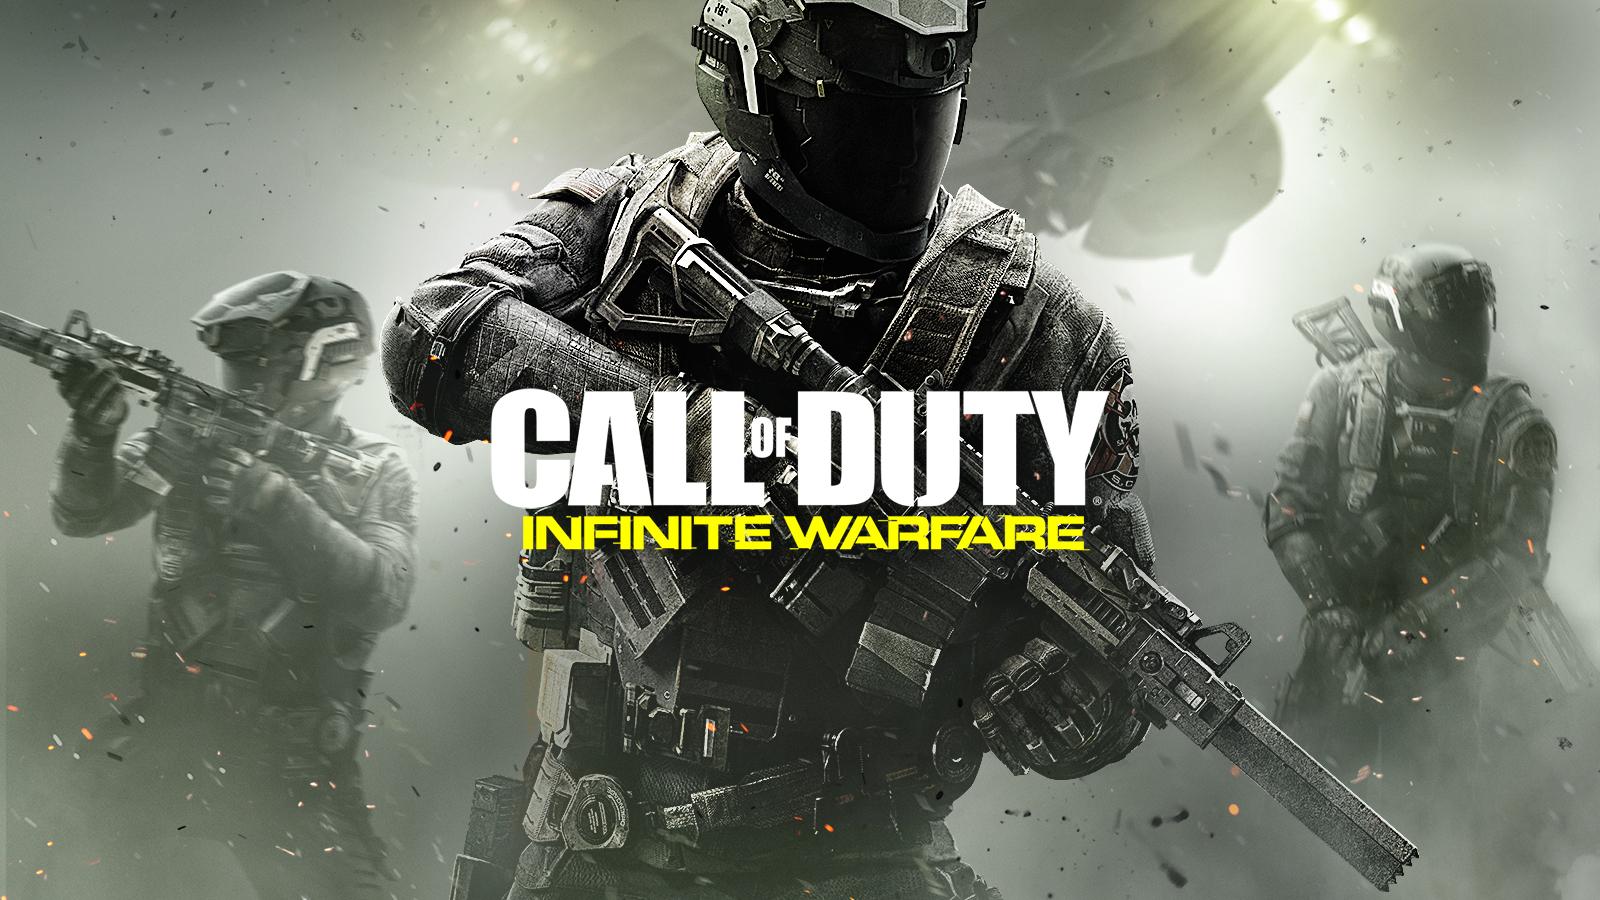 20 hd call of duty infinite warfare wallpapers - Call of duty warfare wallpaper ...